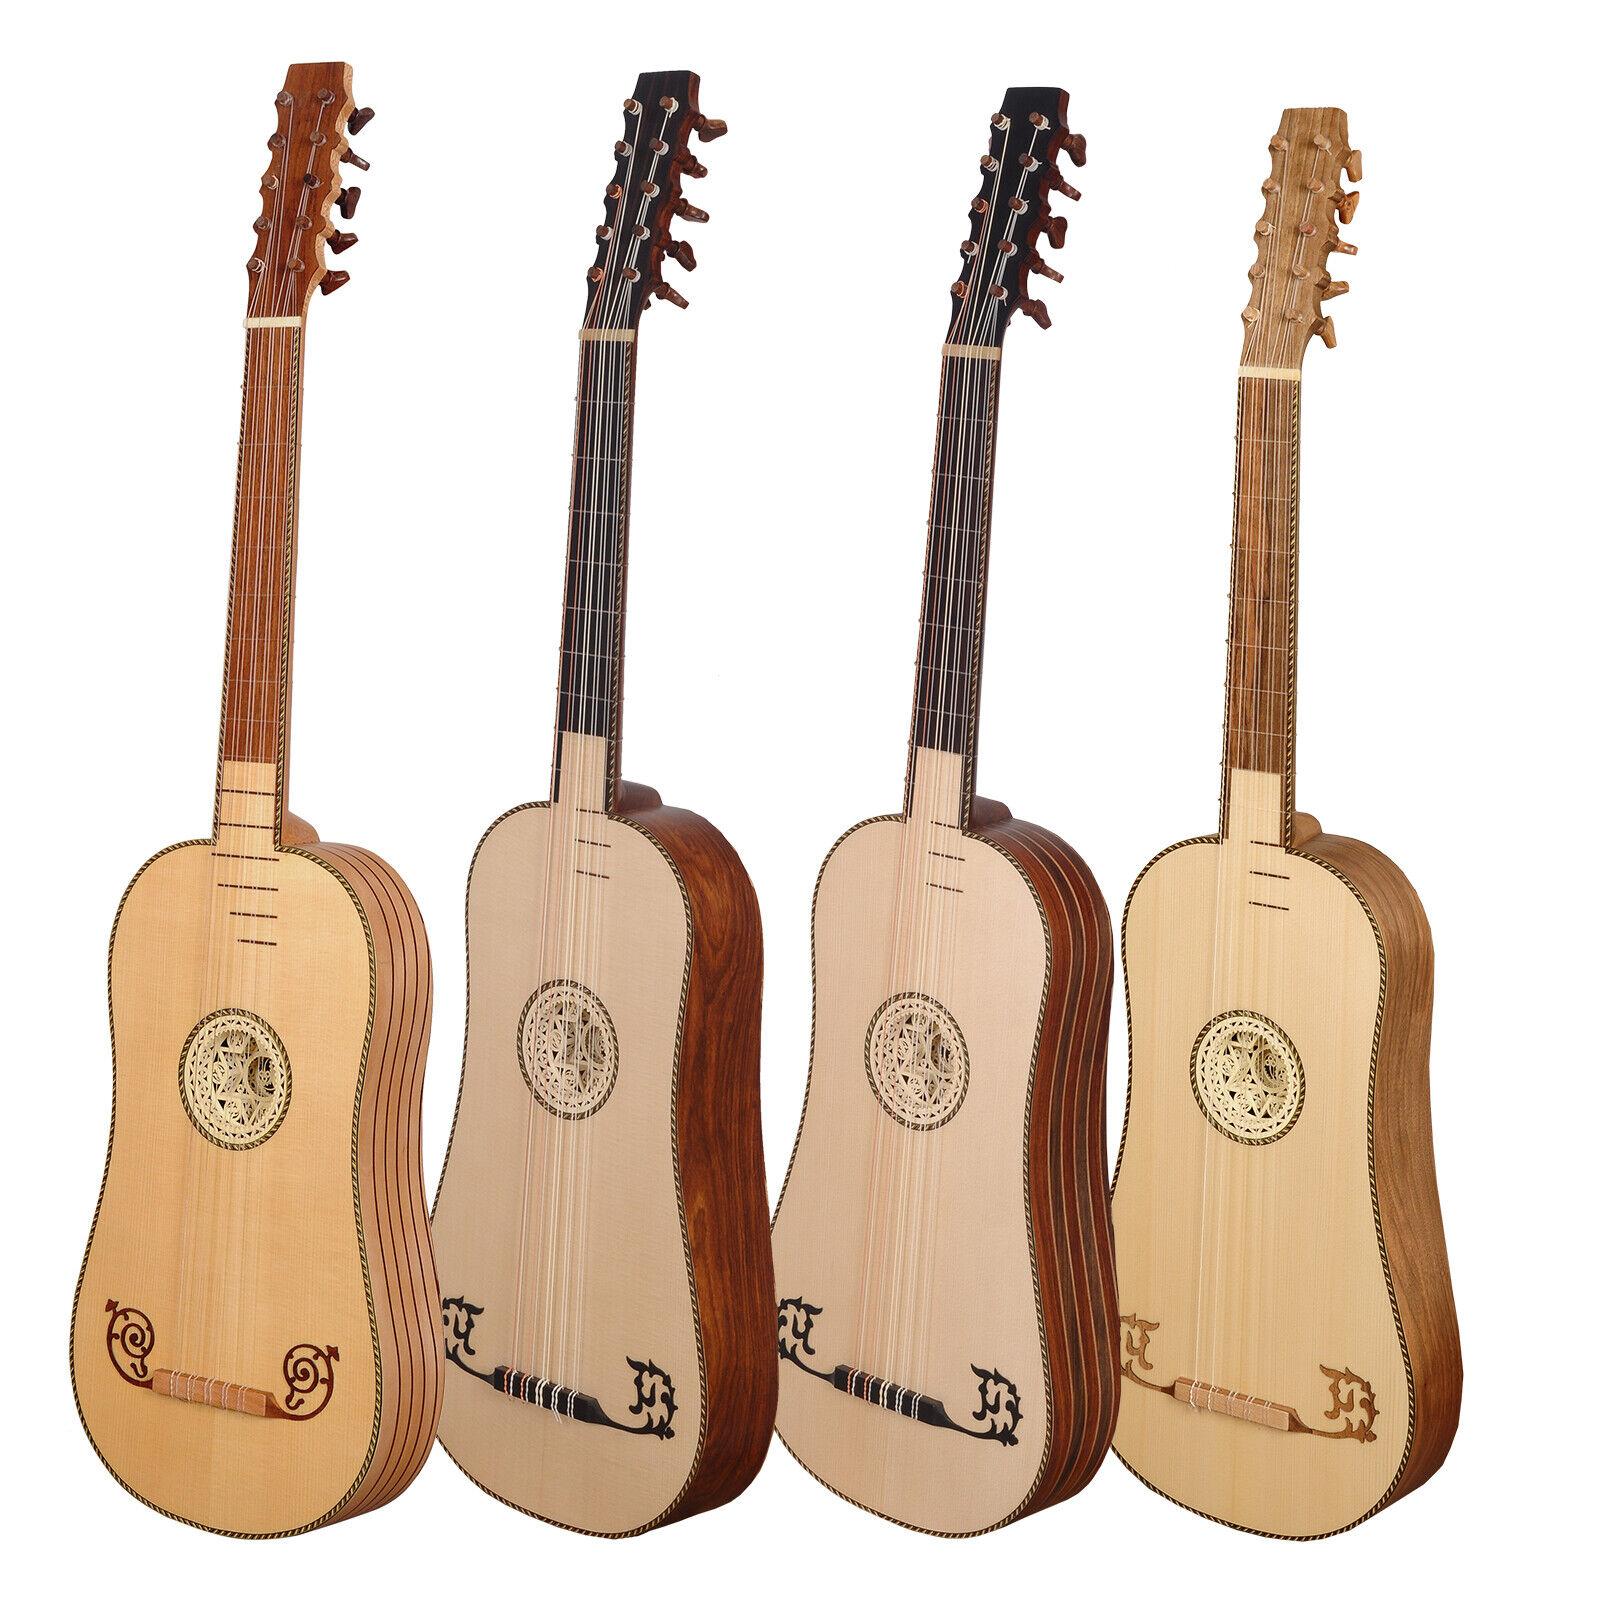 Heartland 5 Course Sellas Baroque Guitar, Barocke Gitarre mit gepolsterter Tasch